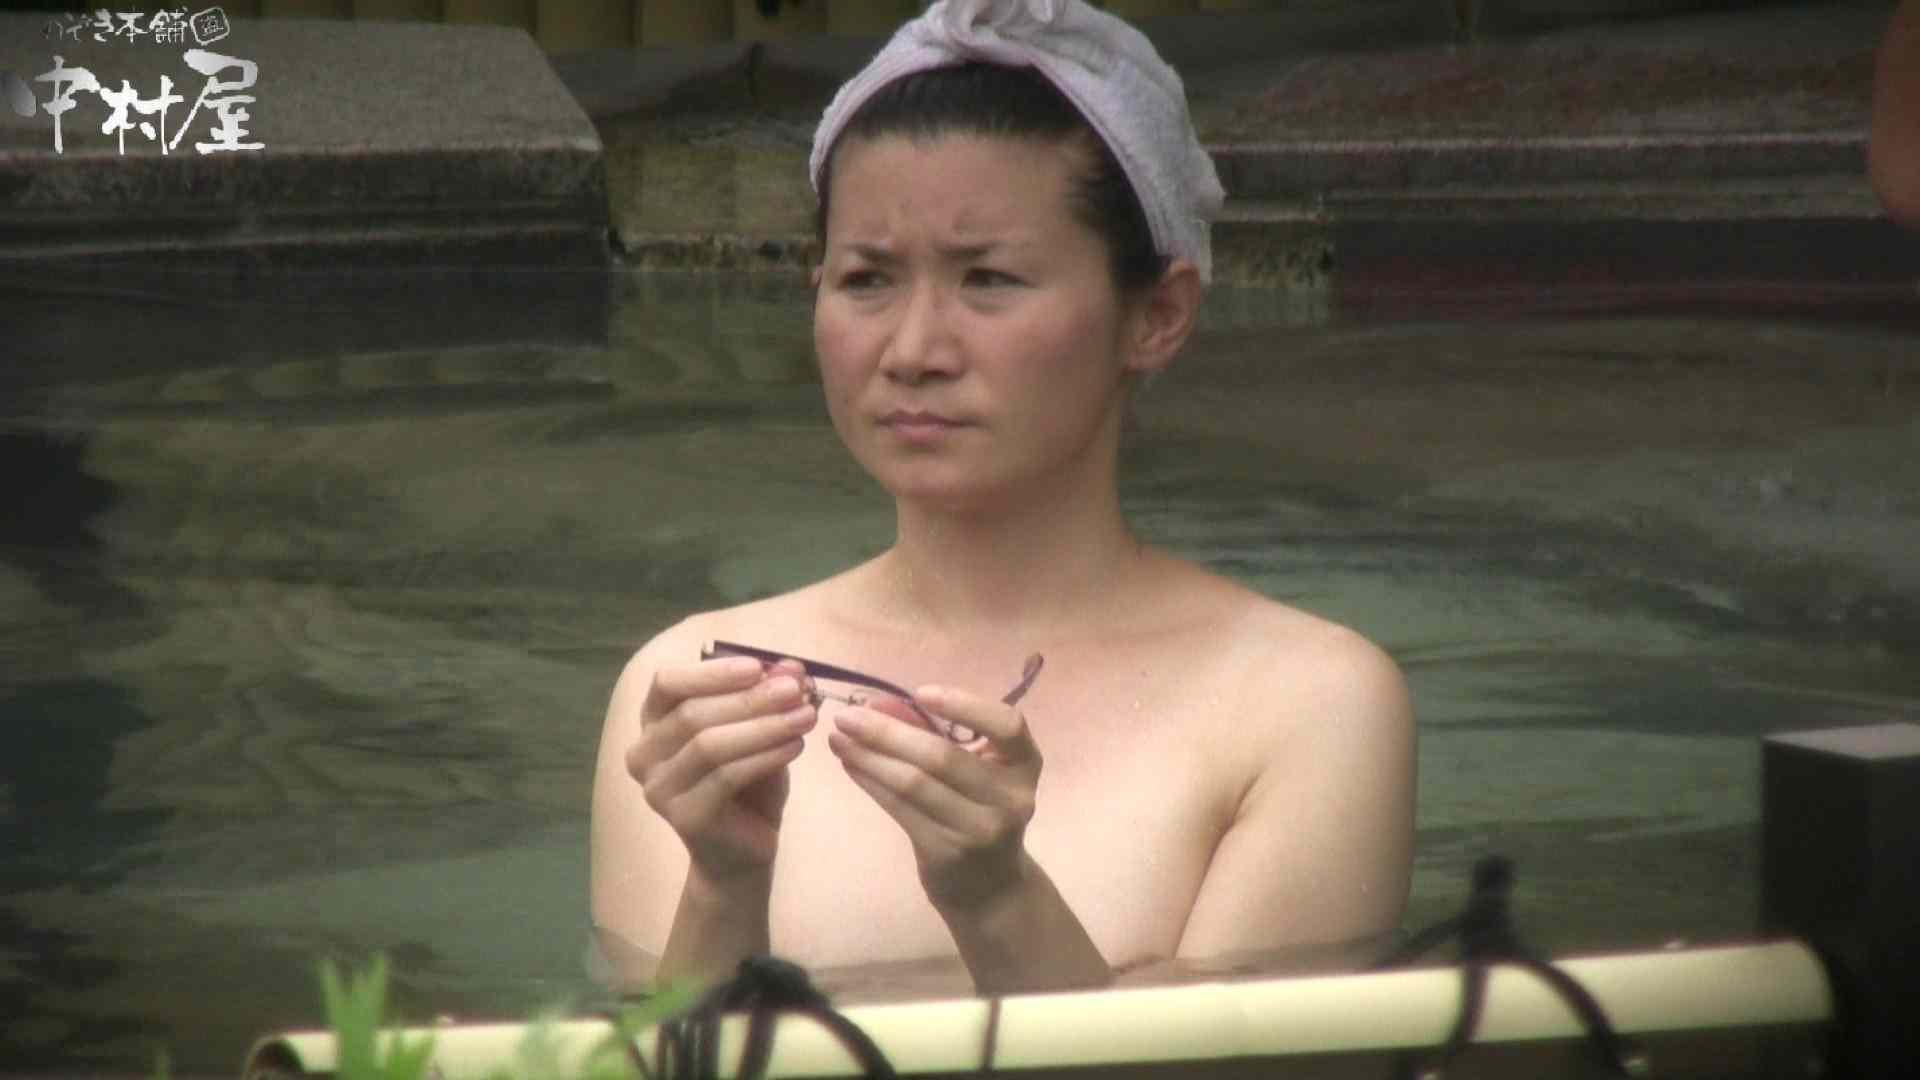 Aquaな露天風呂Vol.905 露天風呂   OLのエロ生活  99連発 25